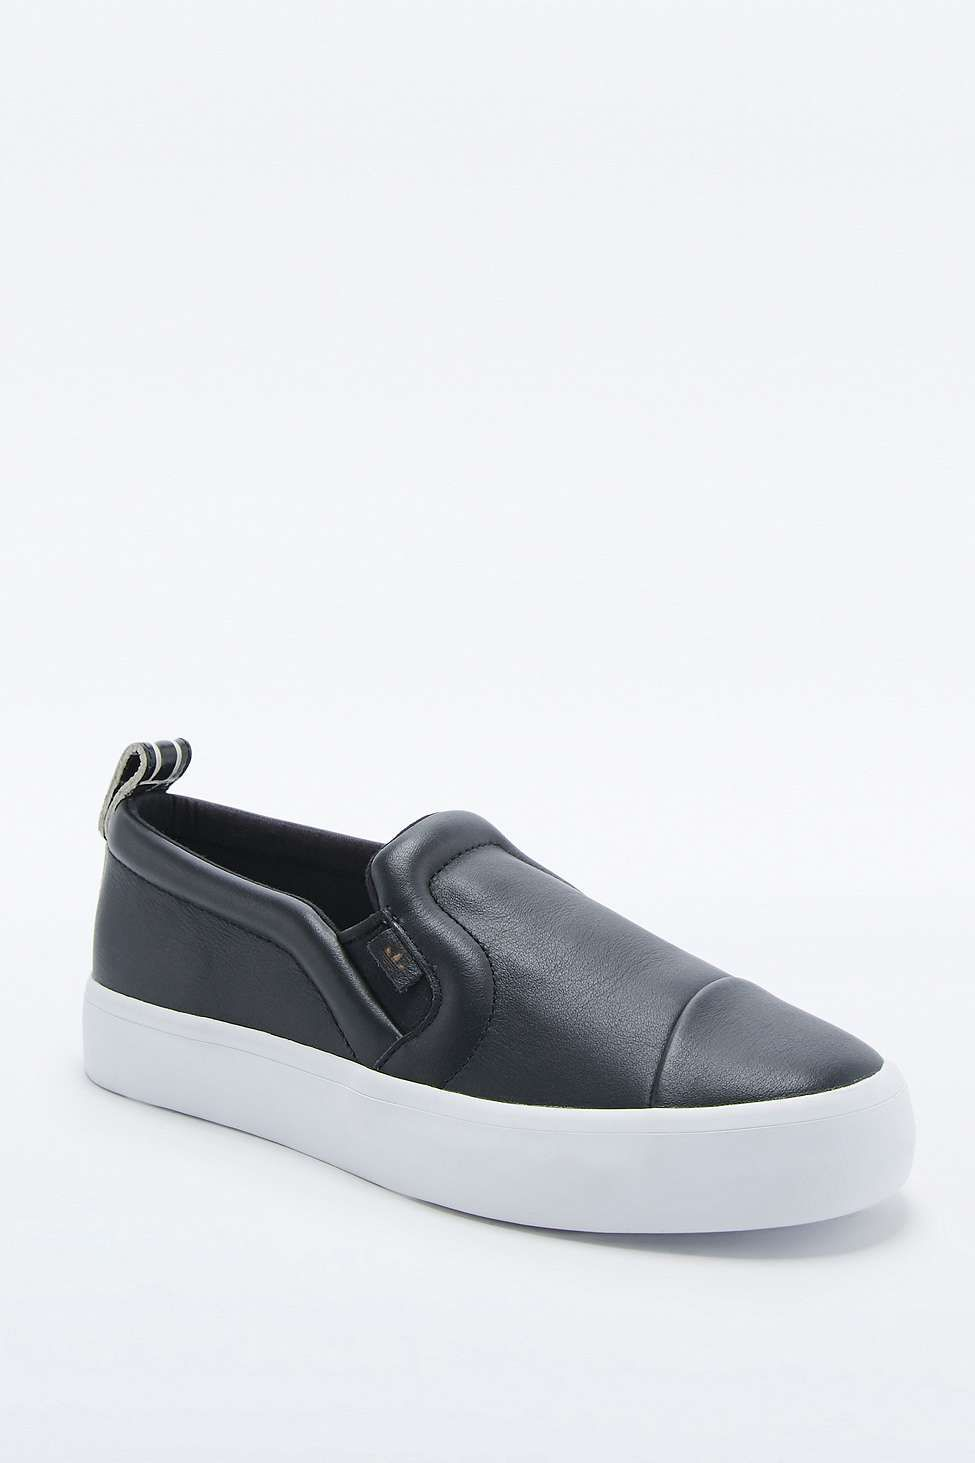 Adidas Originals Honey negro slip zapatillas Urban Outfitters